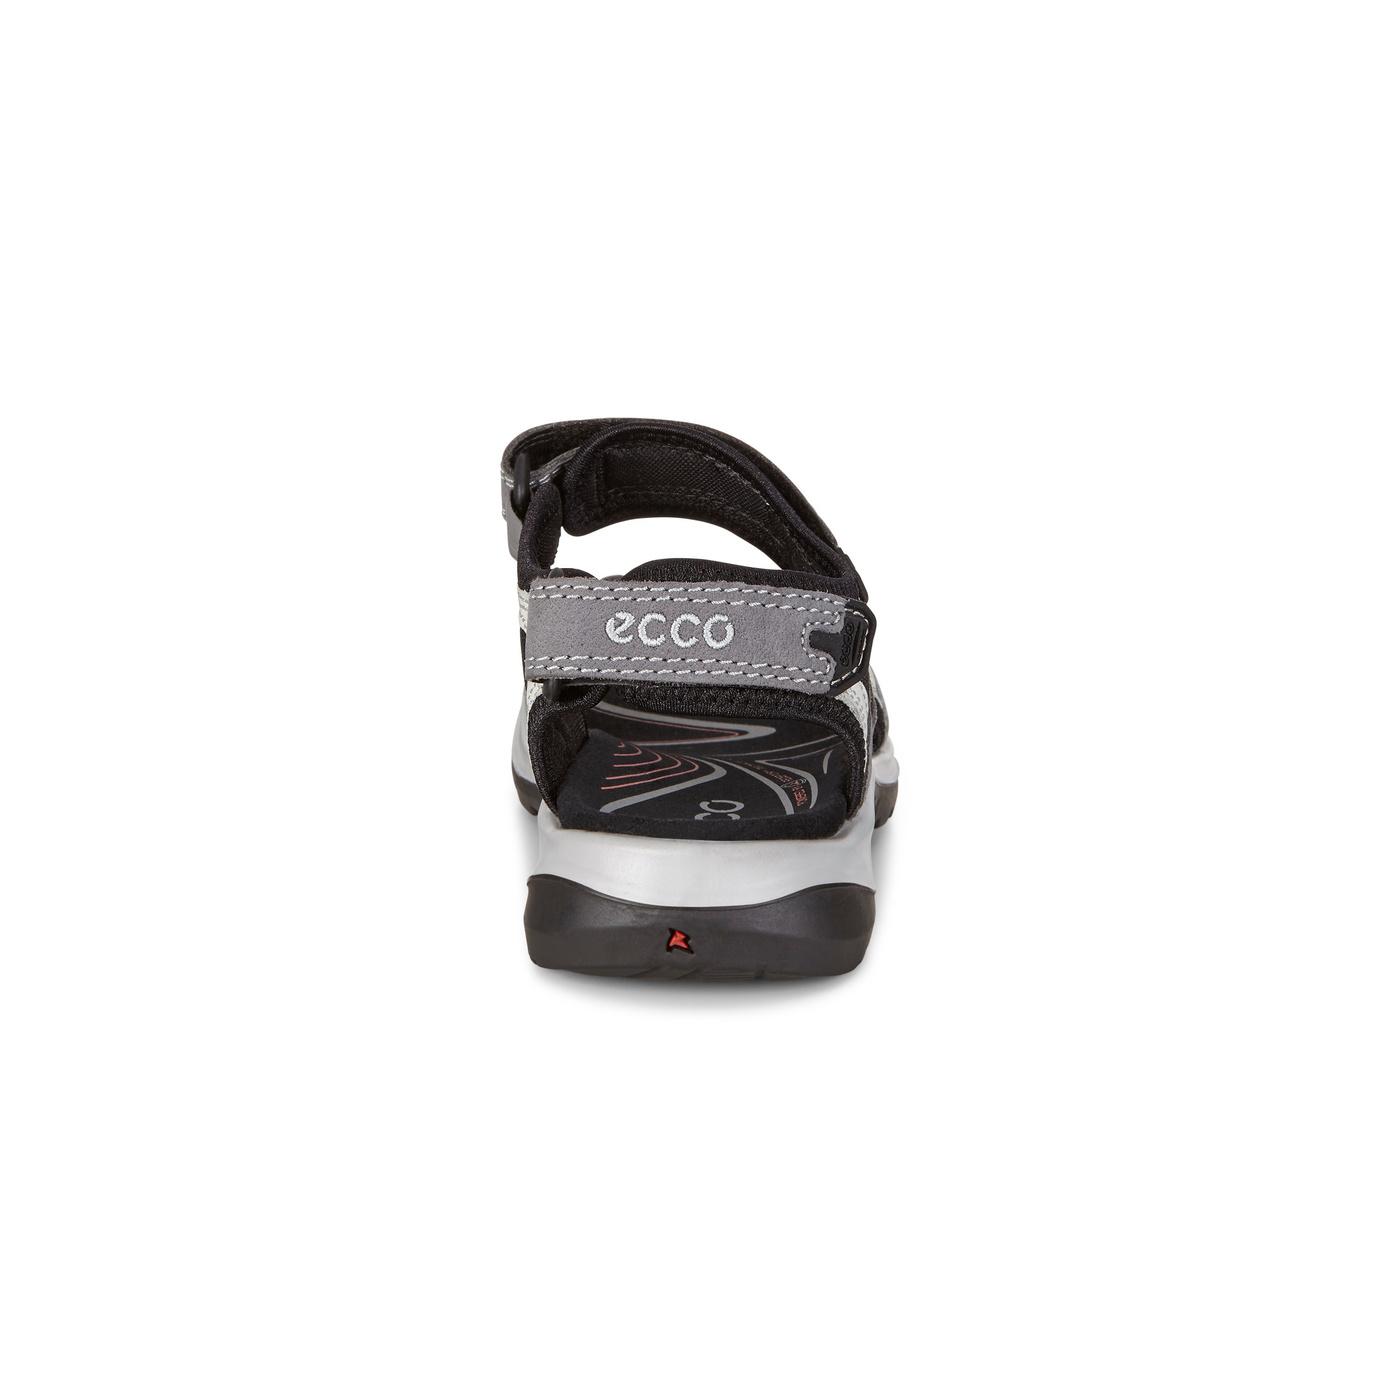 Ecco Offroad Yucatan Titanium 069563 02244